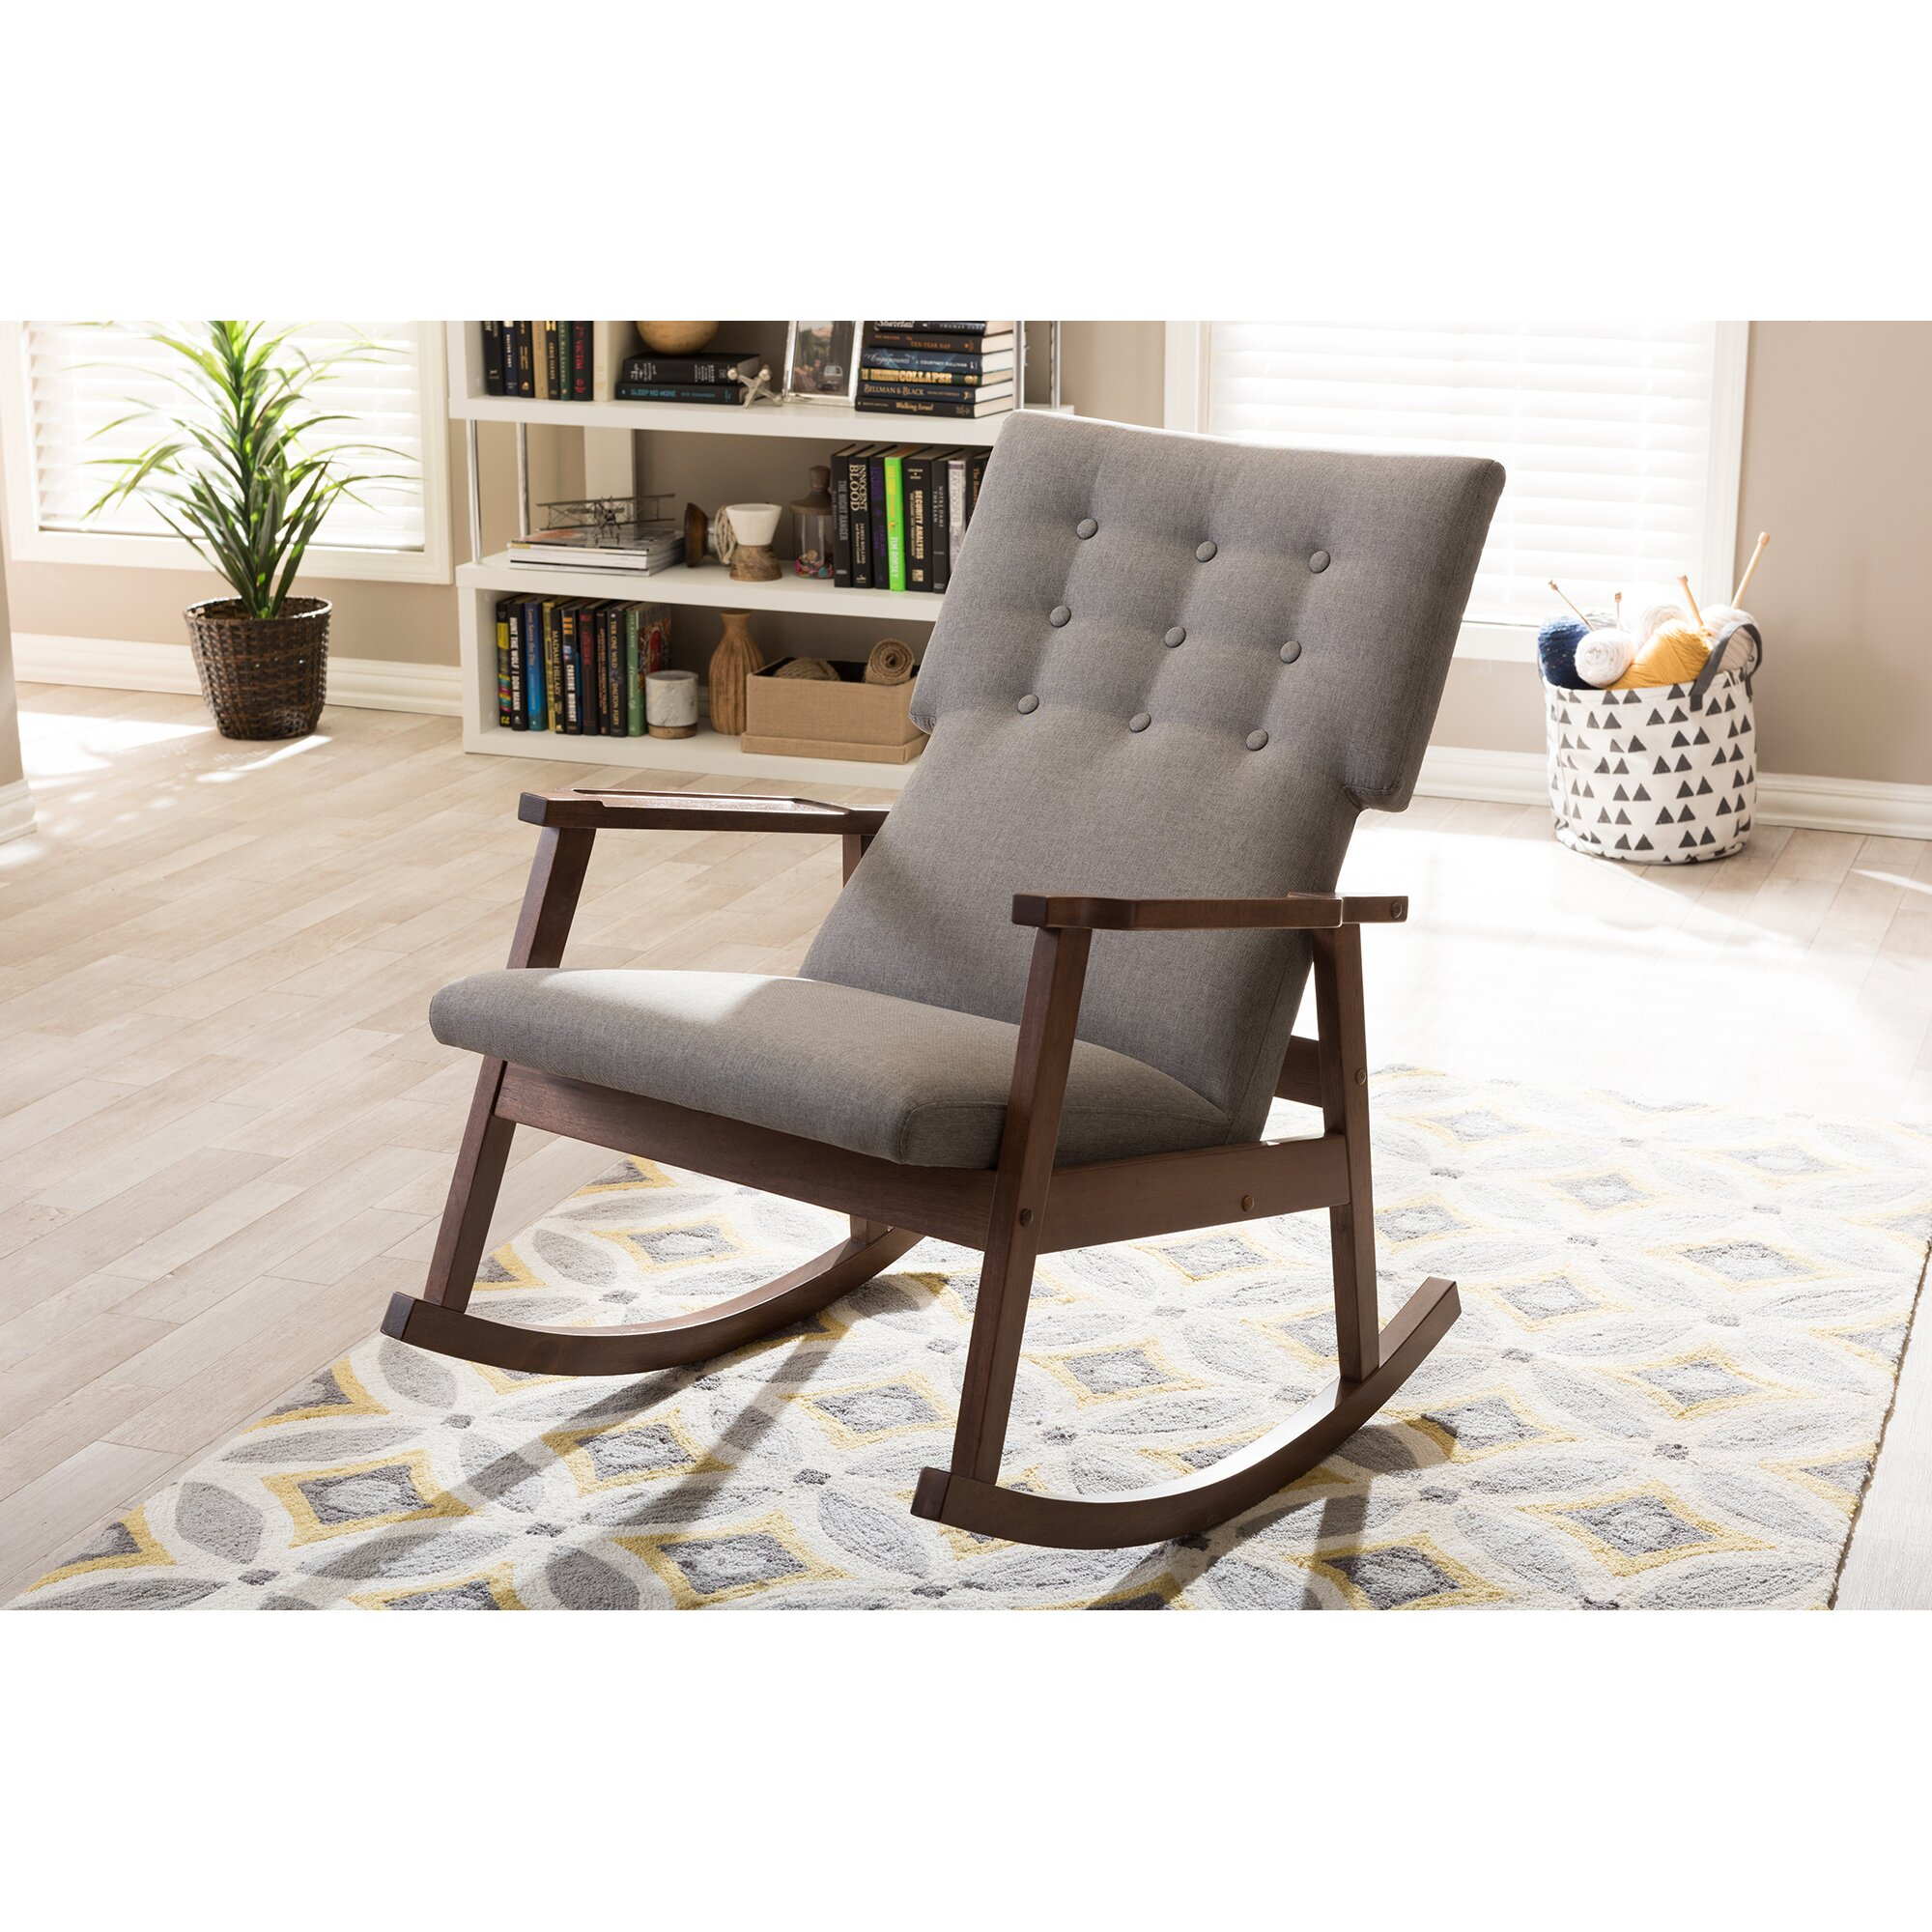 Wholesale interiors baxton studio rocking chair reviews for Baxton studio